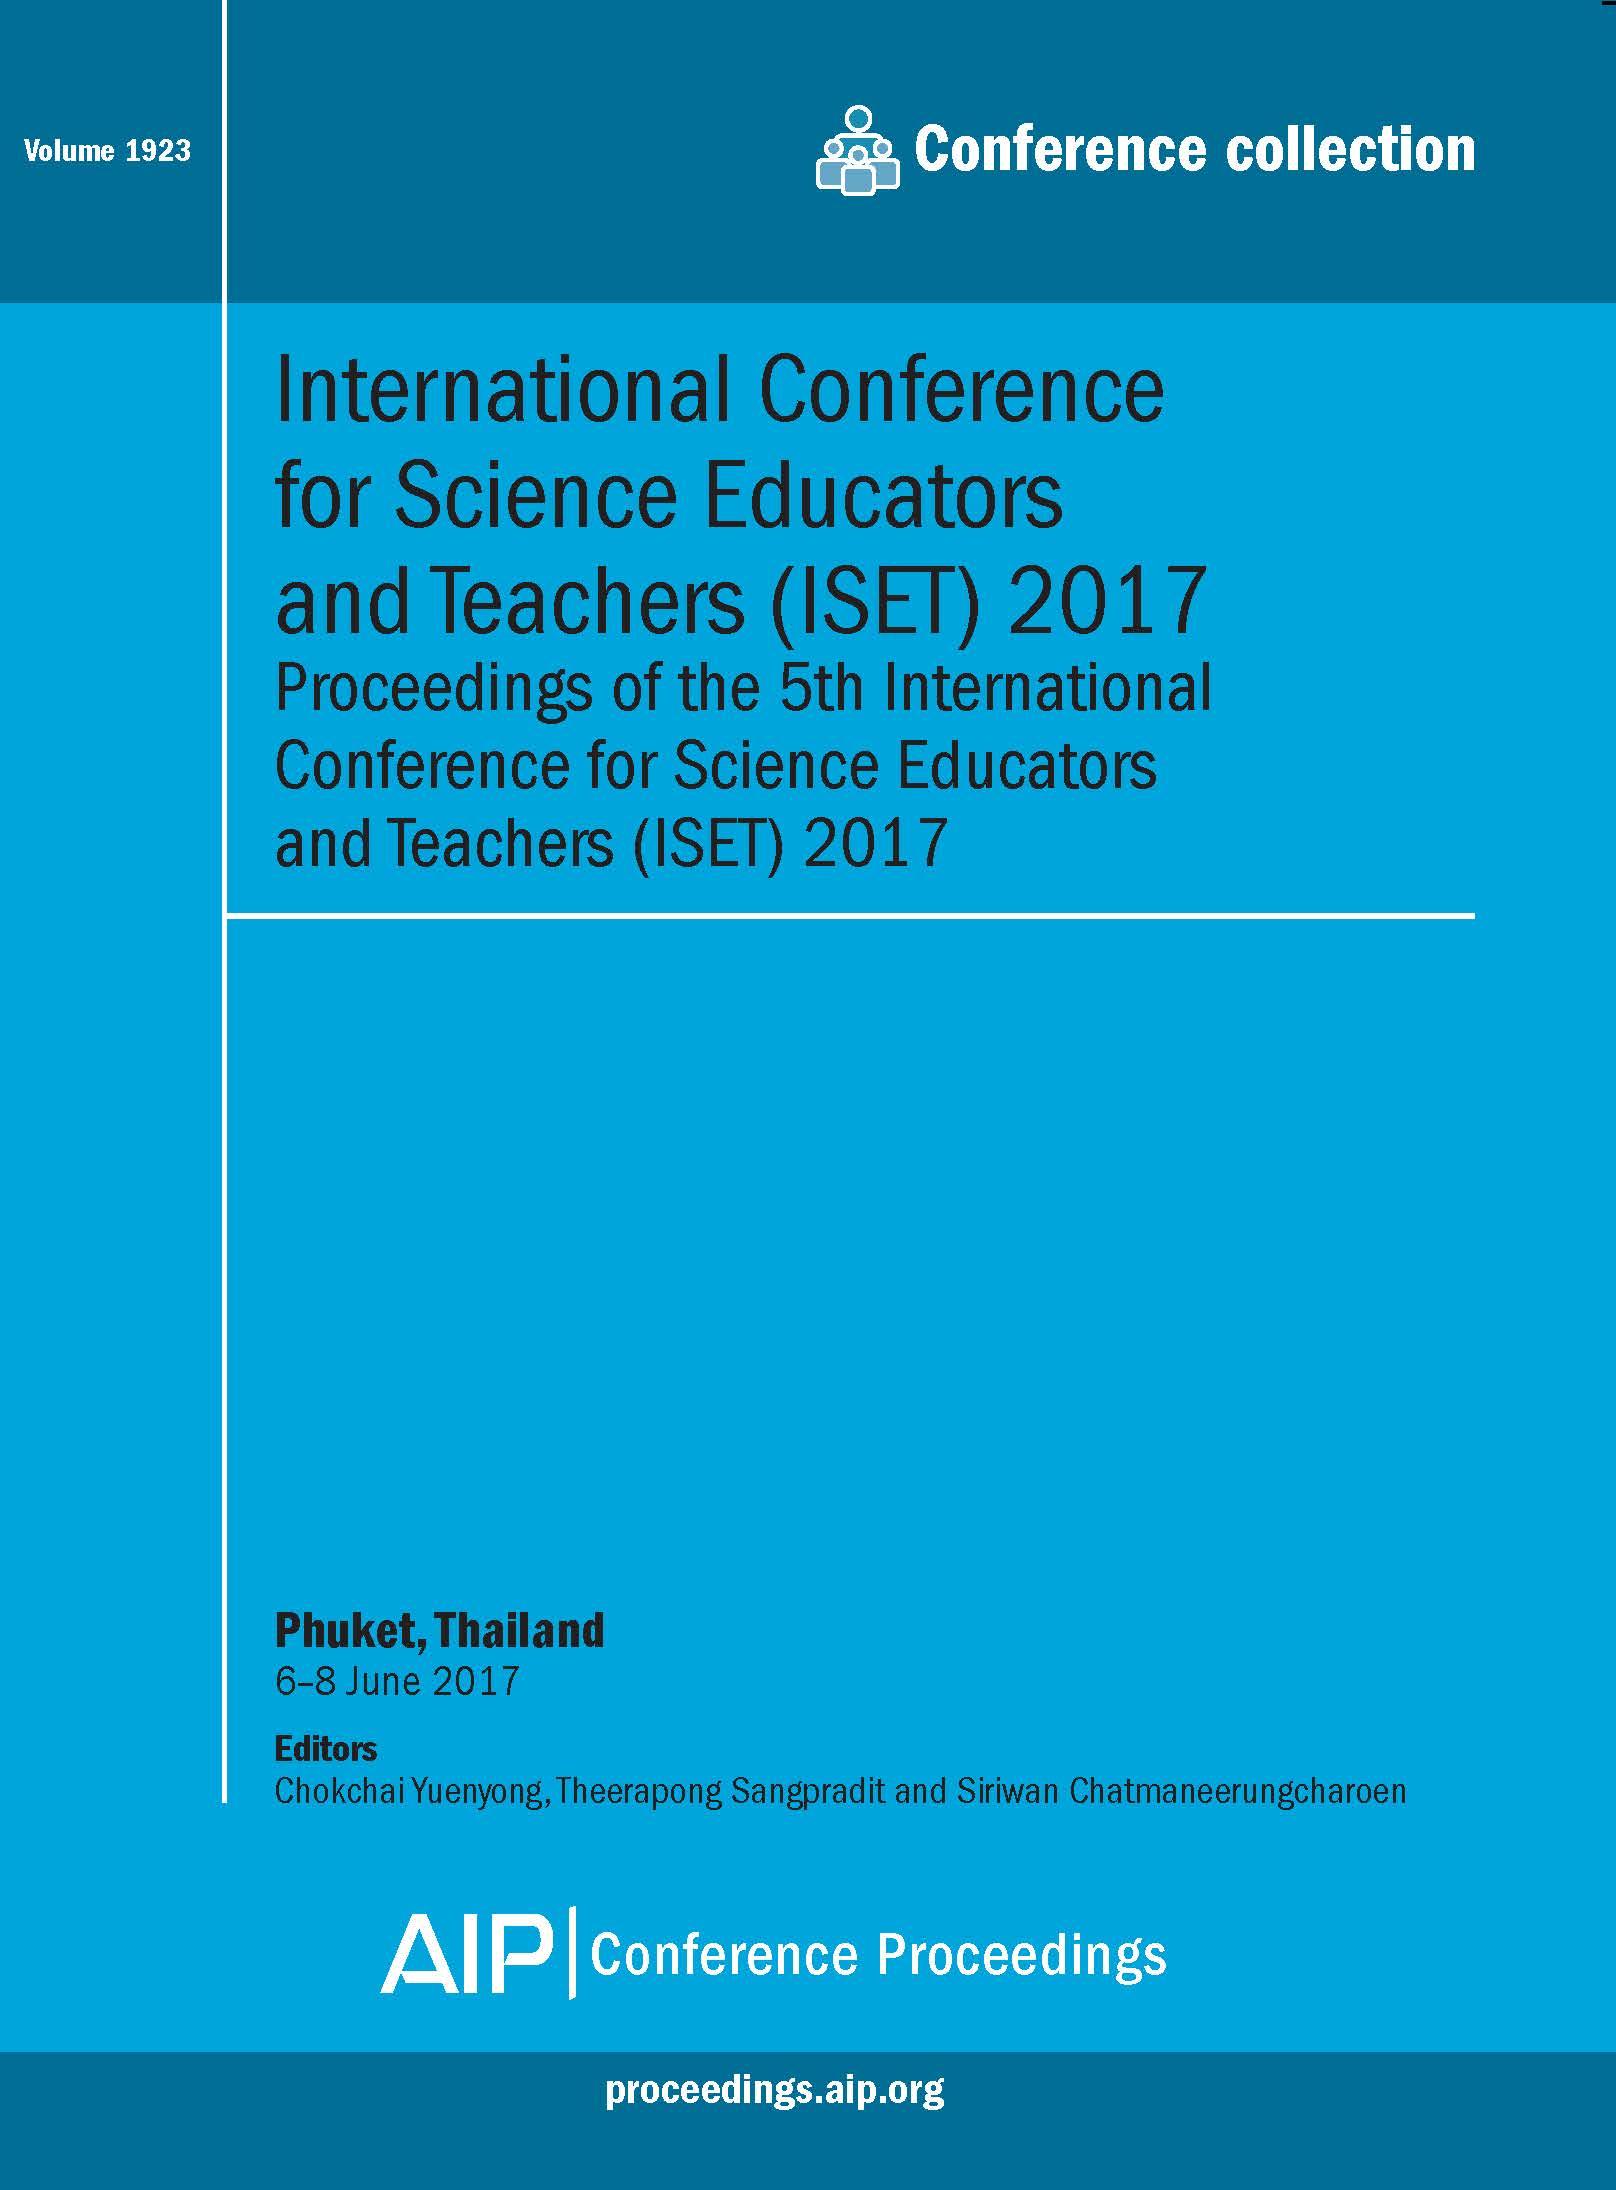 Volume 1923: International Conference of Science Educators